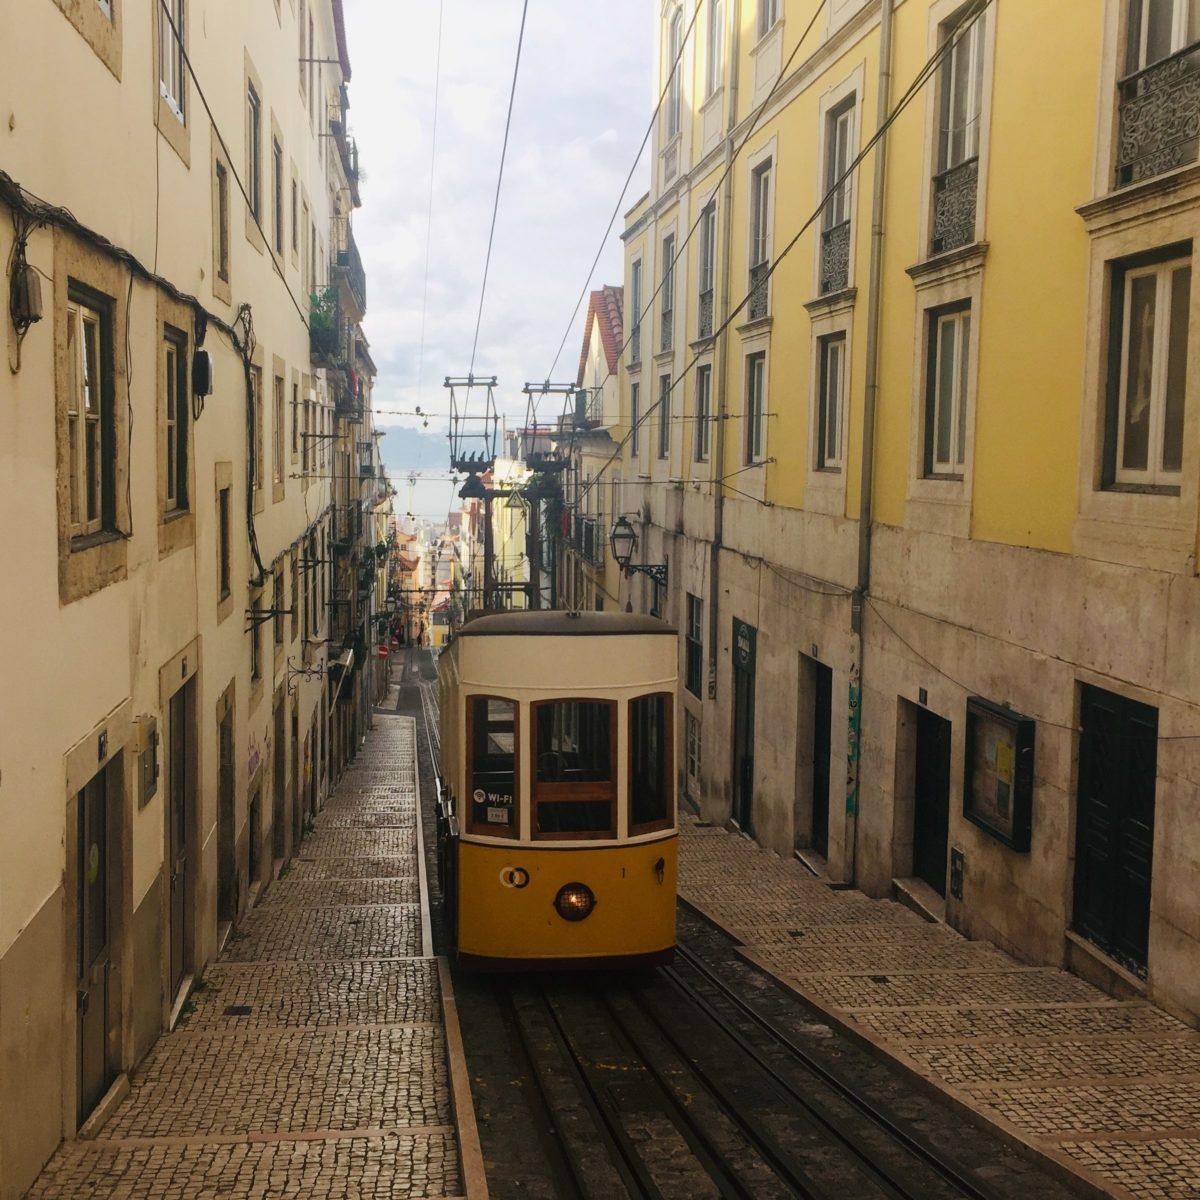 Elevador da Bica in Lissabon